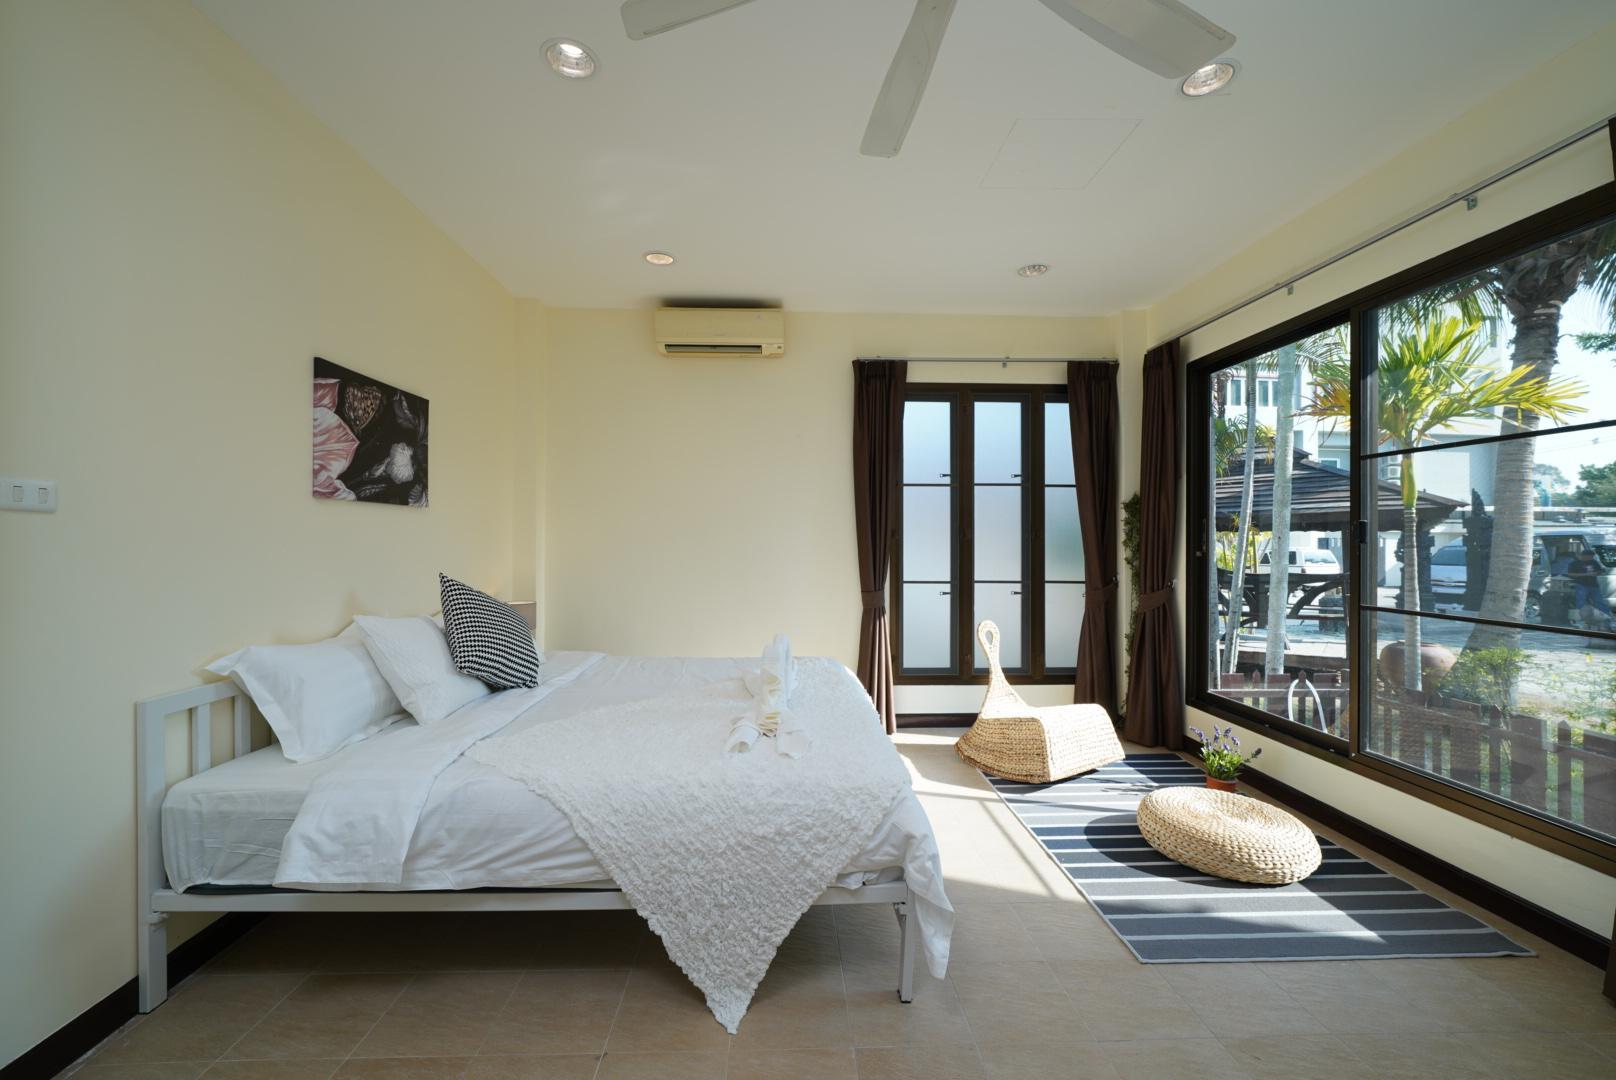 Asia House Pattaya Luxury Four Bedroom Pool Resort